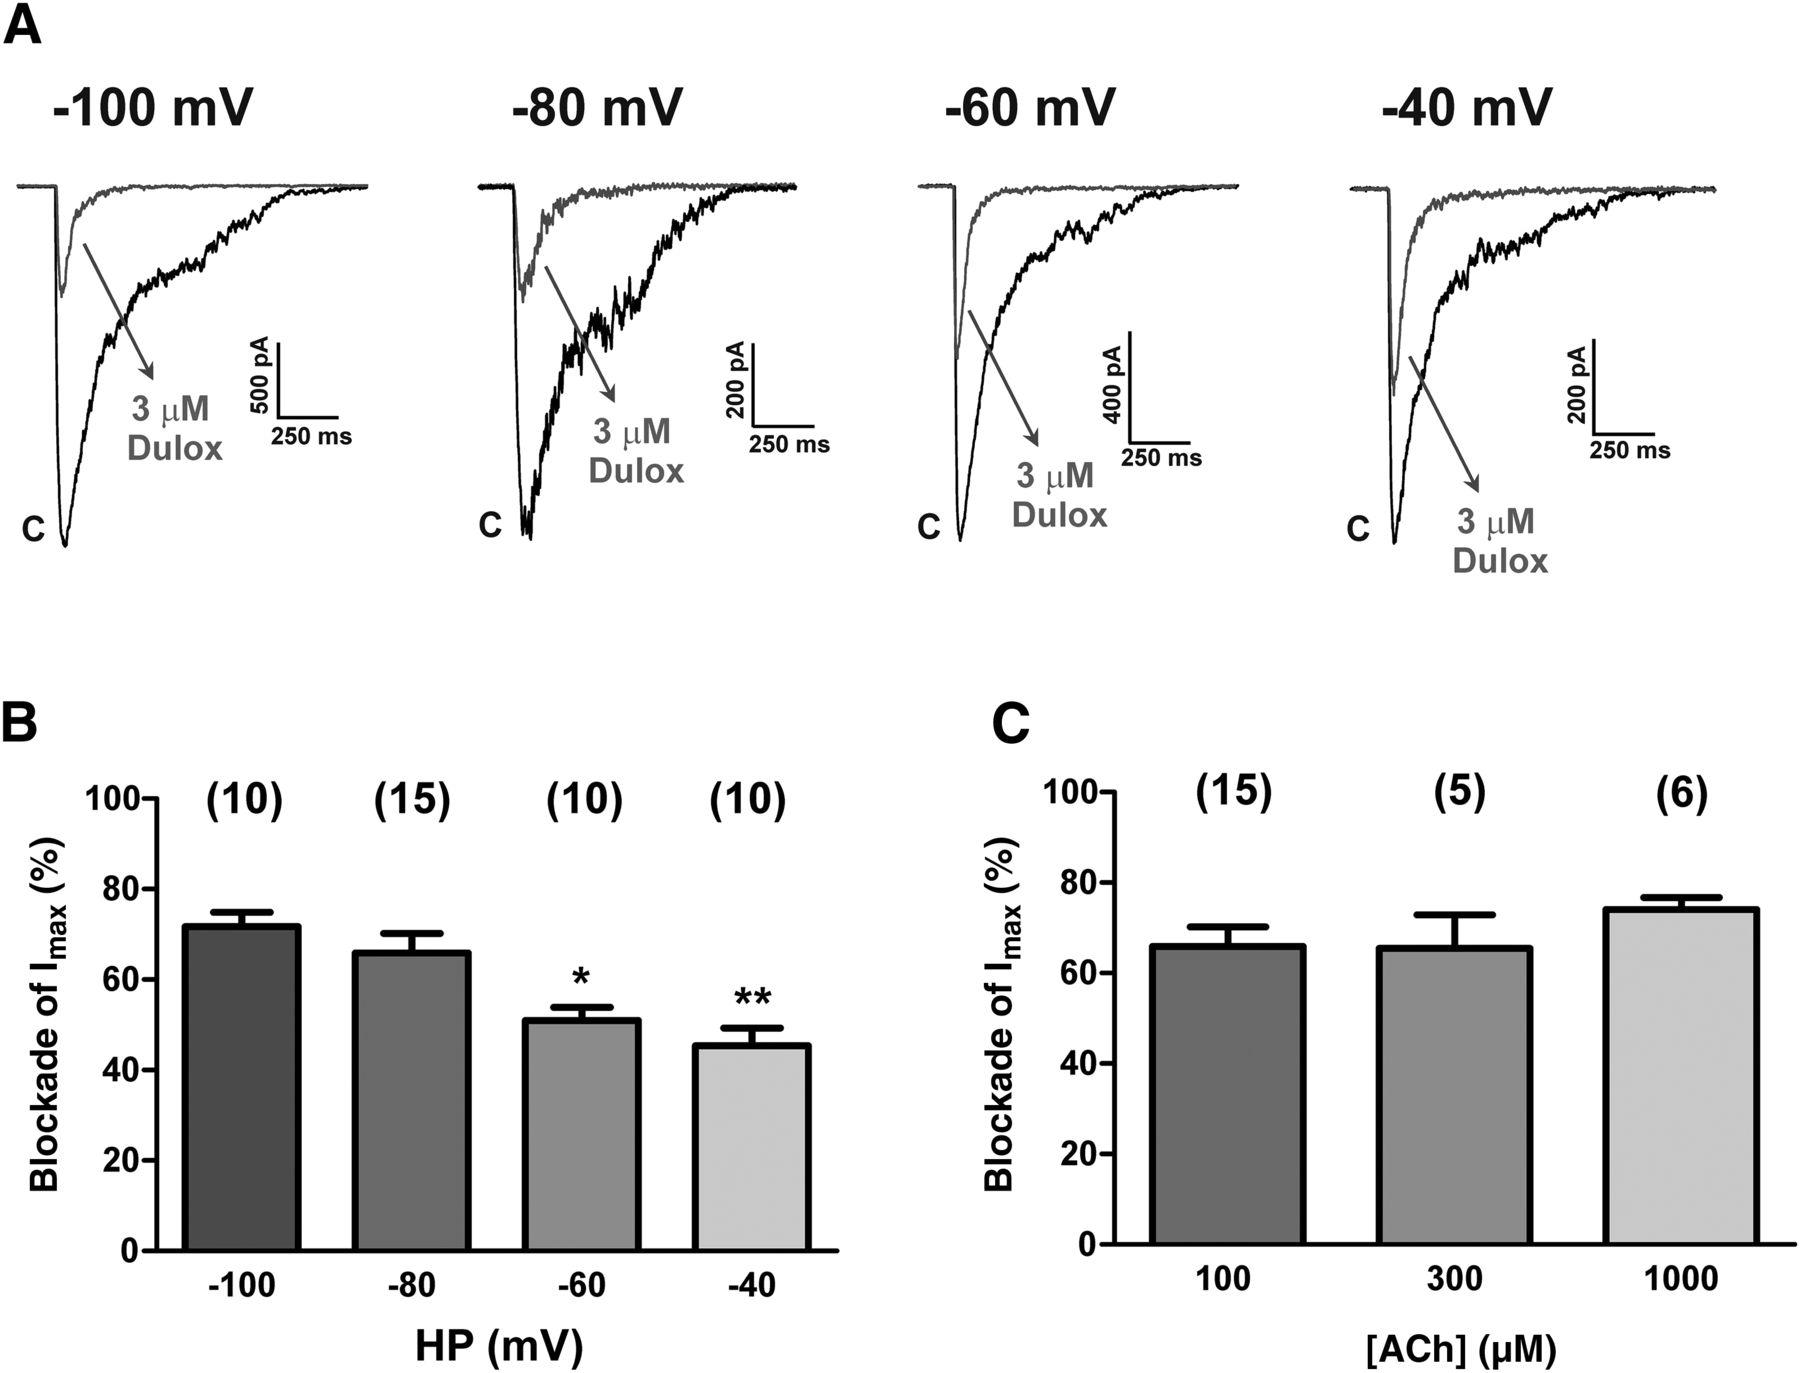 Dual Antidepressant Duloxetine Blocks Nicotinic Receptor